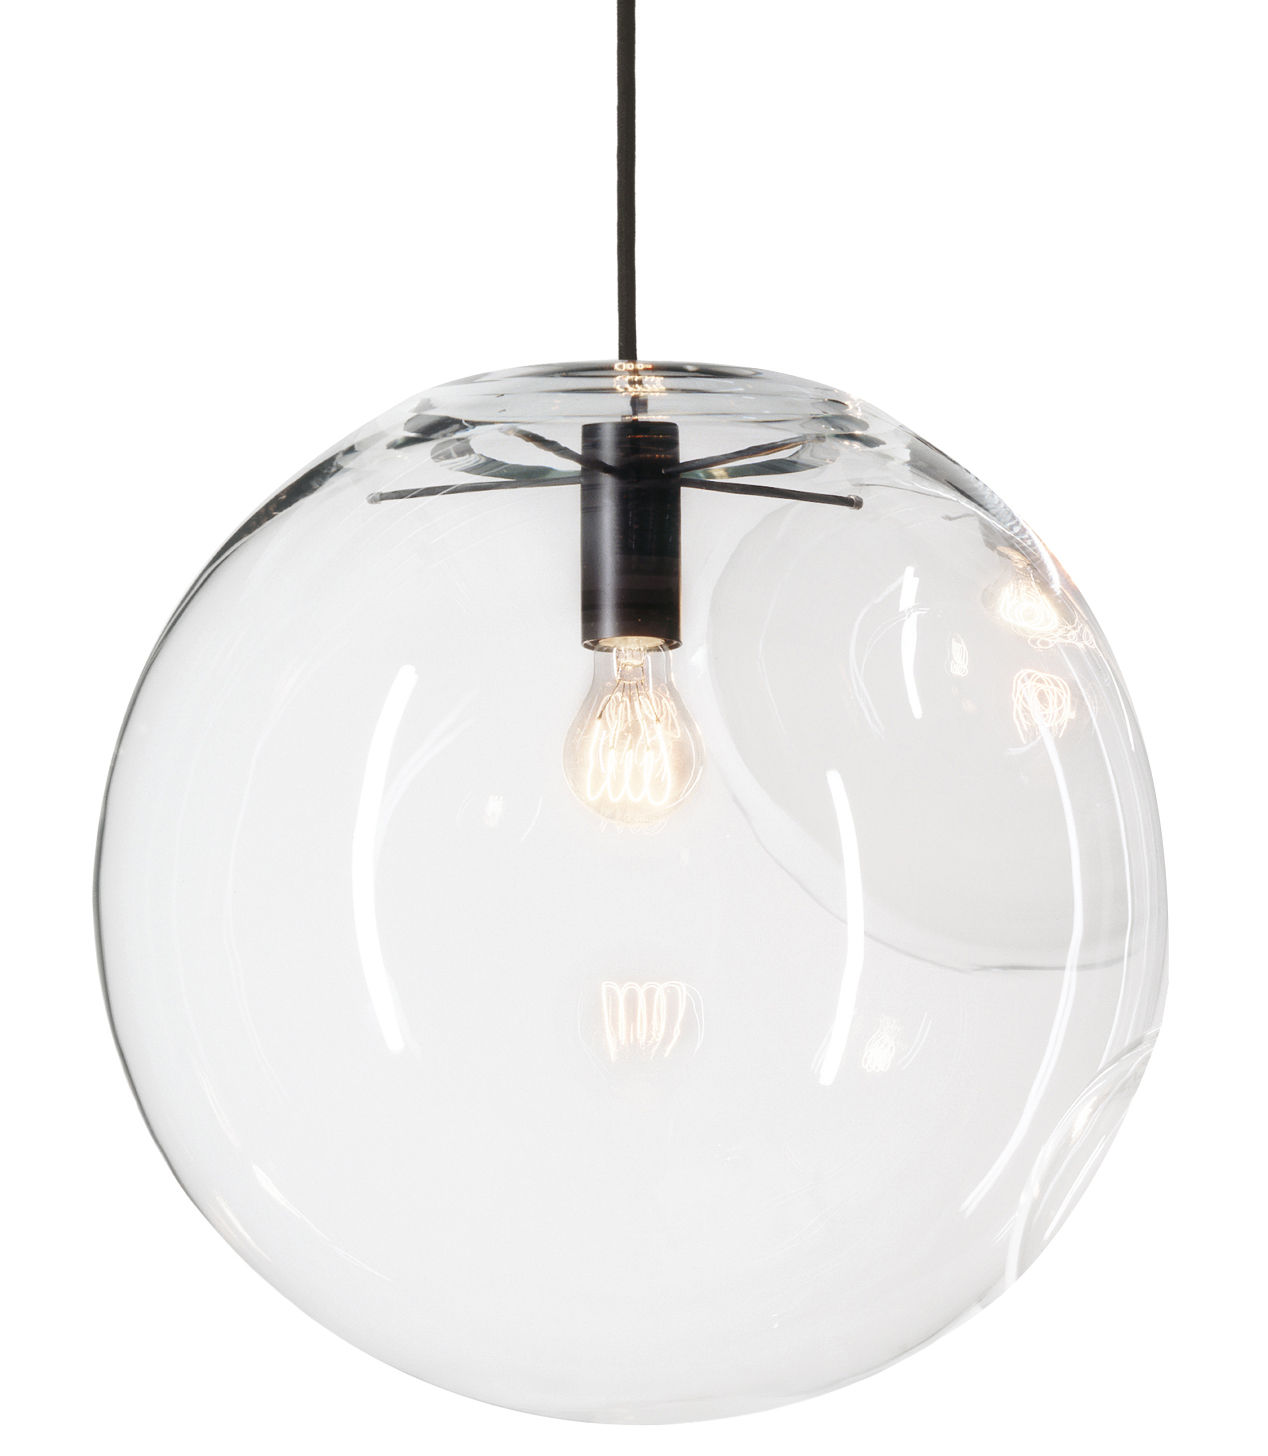 Leuchten - Pendelleuchten - Selene Pendelleuchte - ClassiCon - Ø 45 cm - Glas - lackiertes Metall, mundgeblasenes Glas